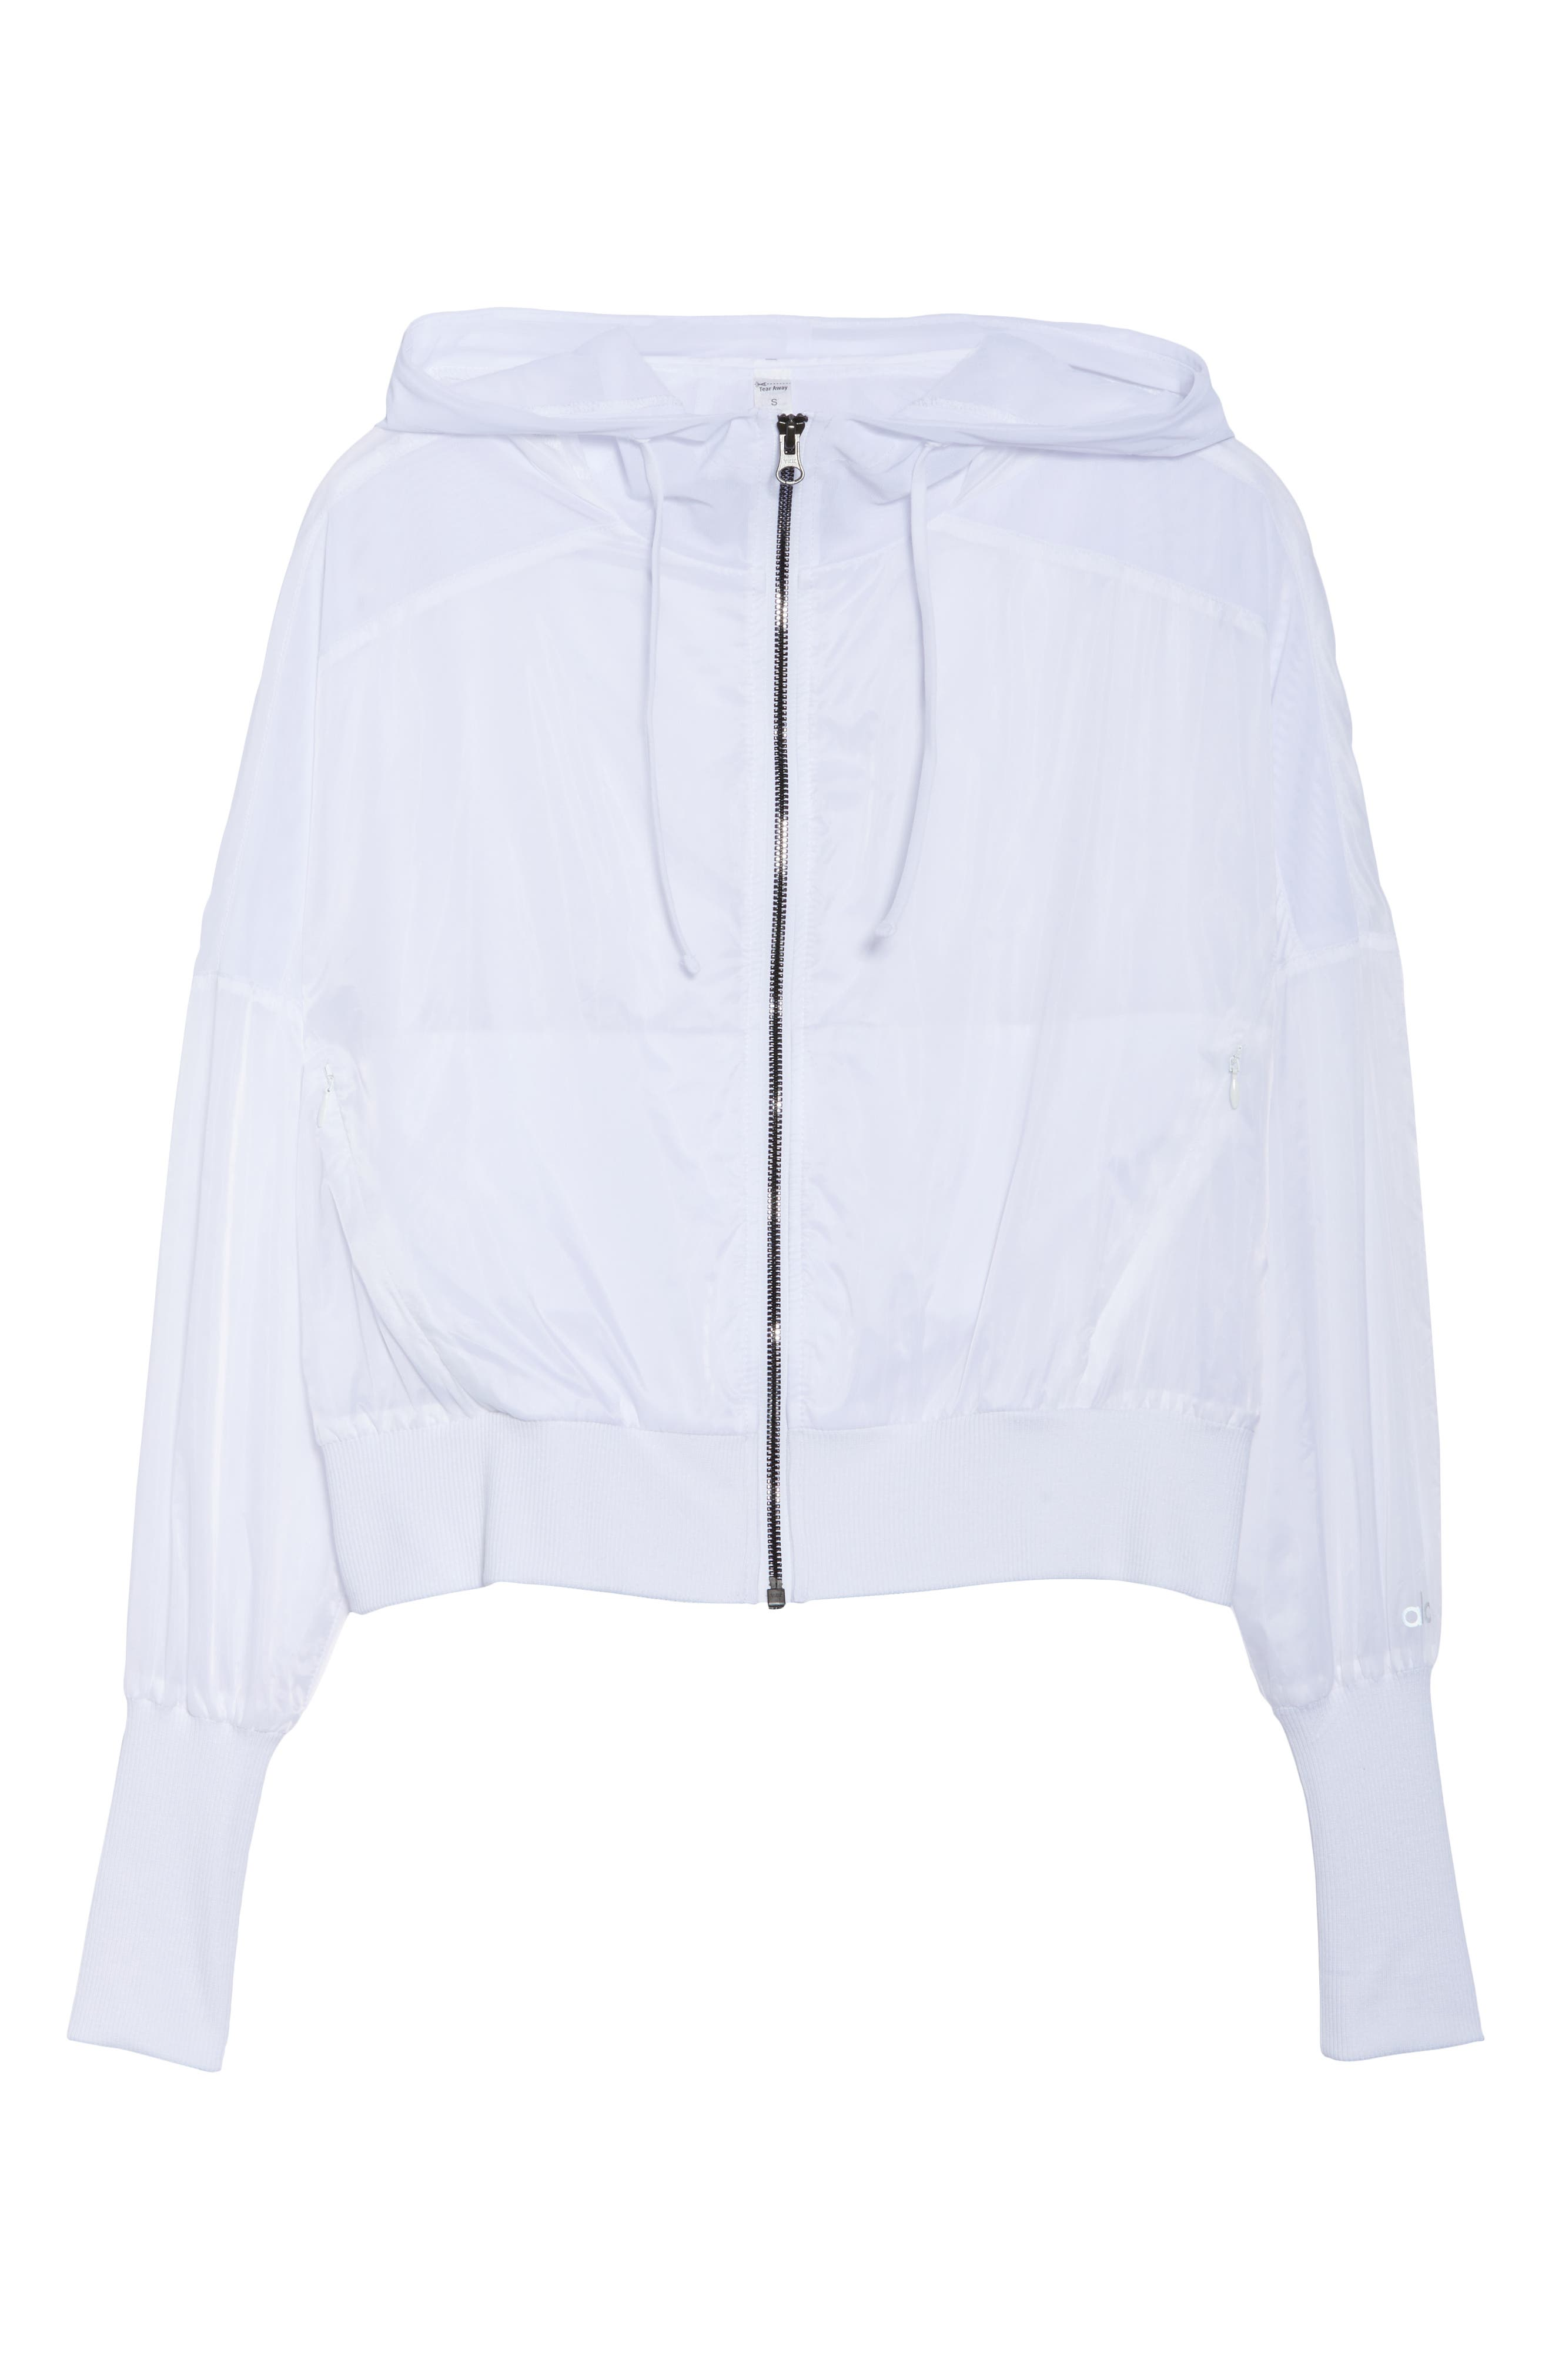 Aqua Jacket,                             Alternate thumbnail 7, color,                             White